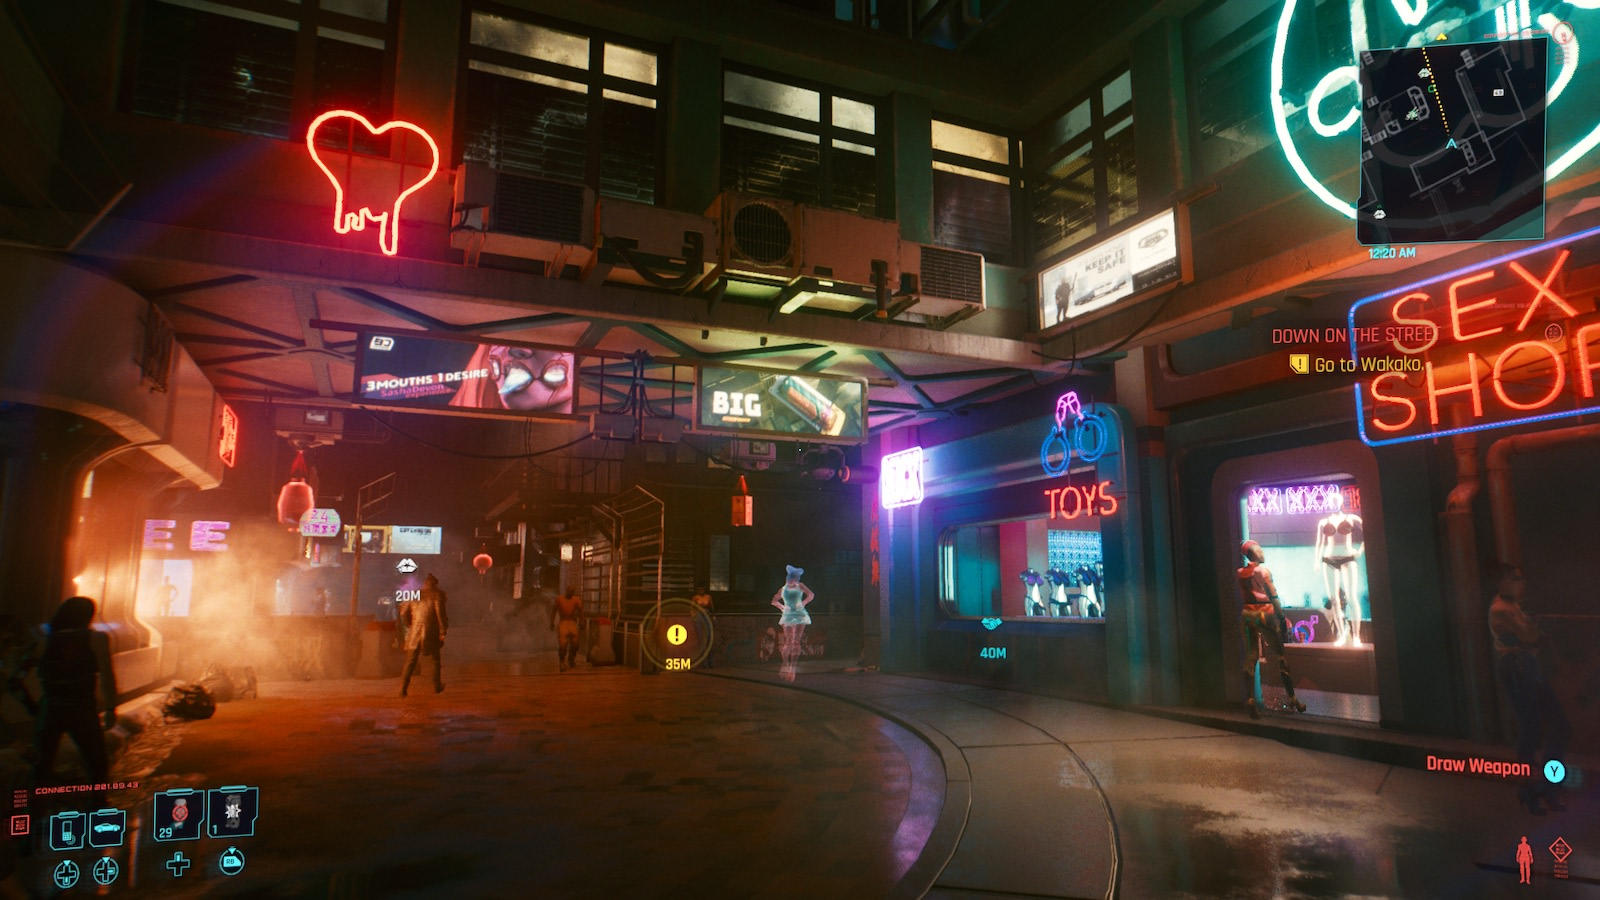 Cyberpunk 2077' is worth the wait   Engadget